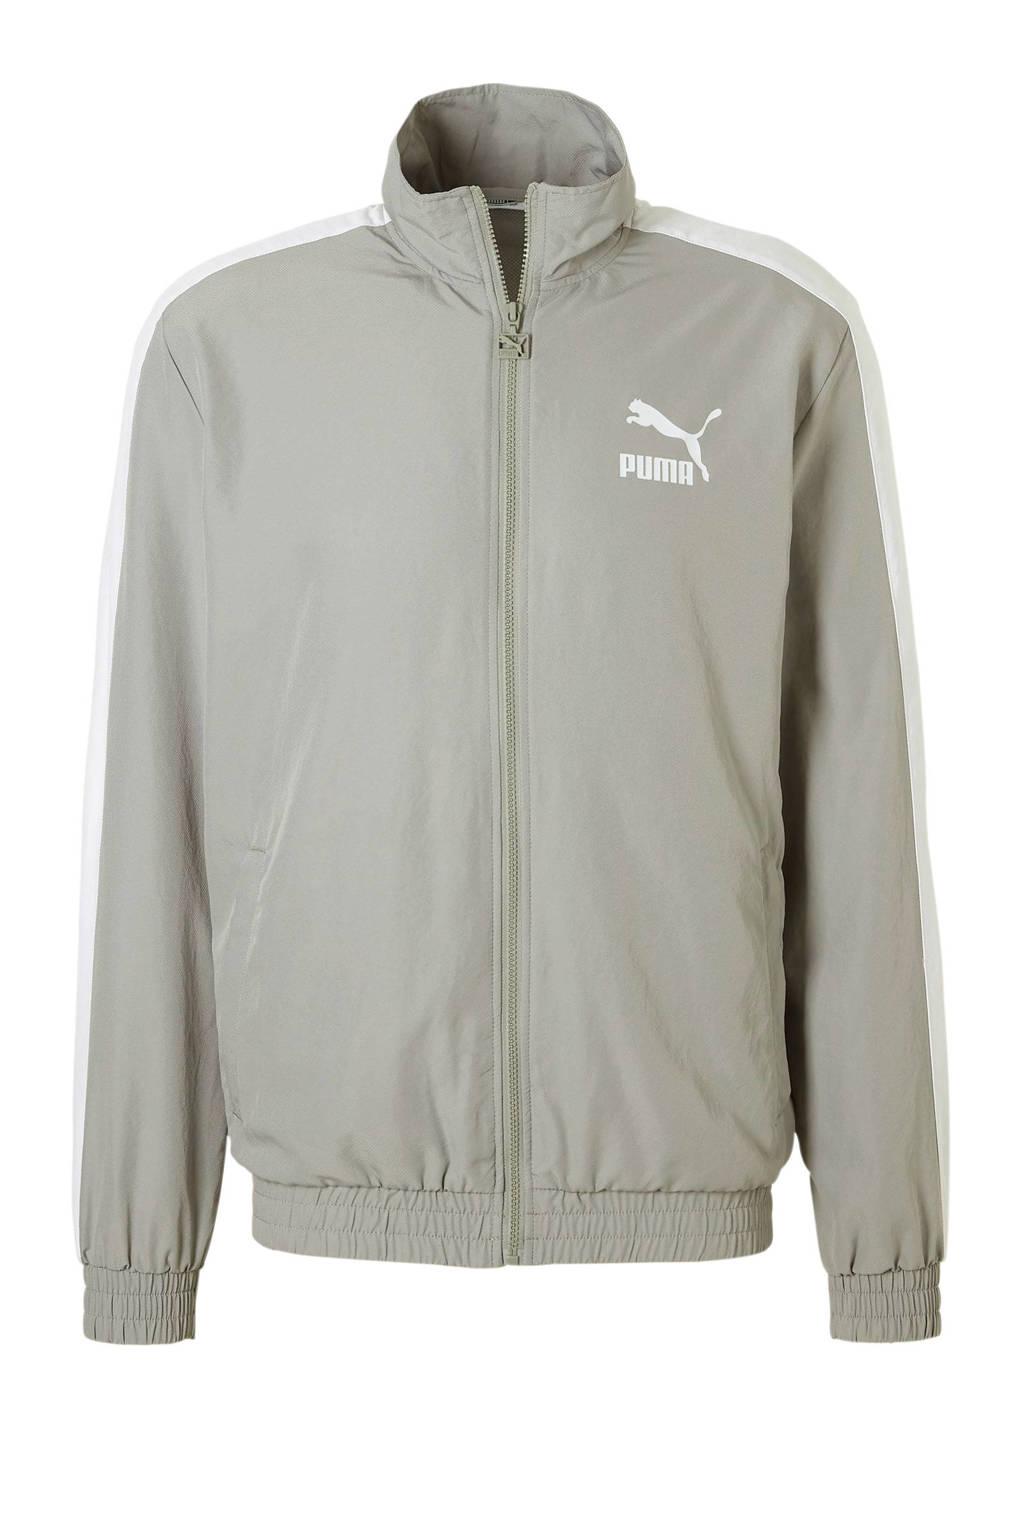 Puma   vest, Lichtgrijs/wit